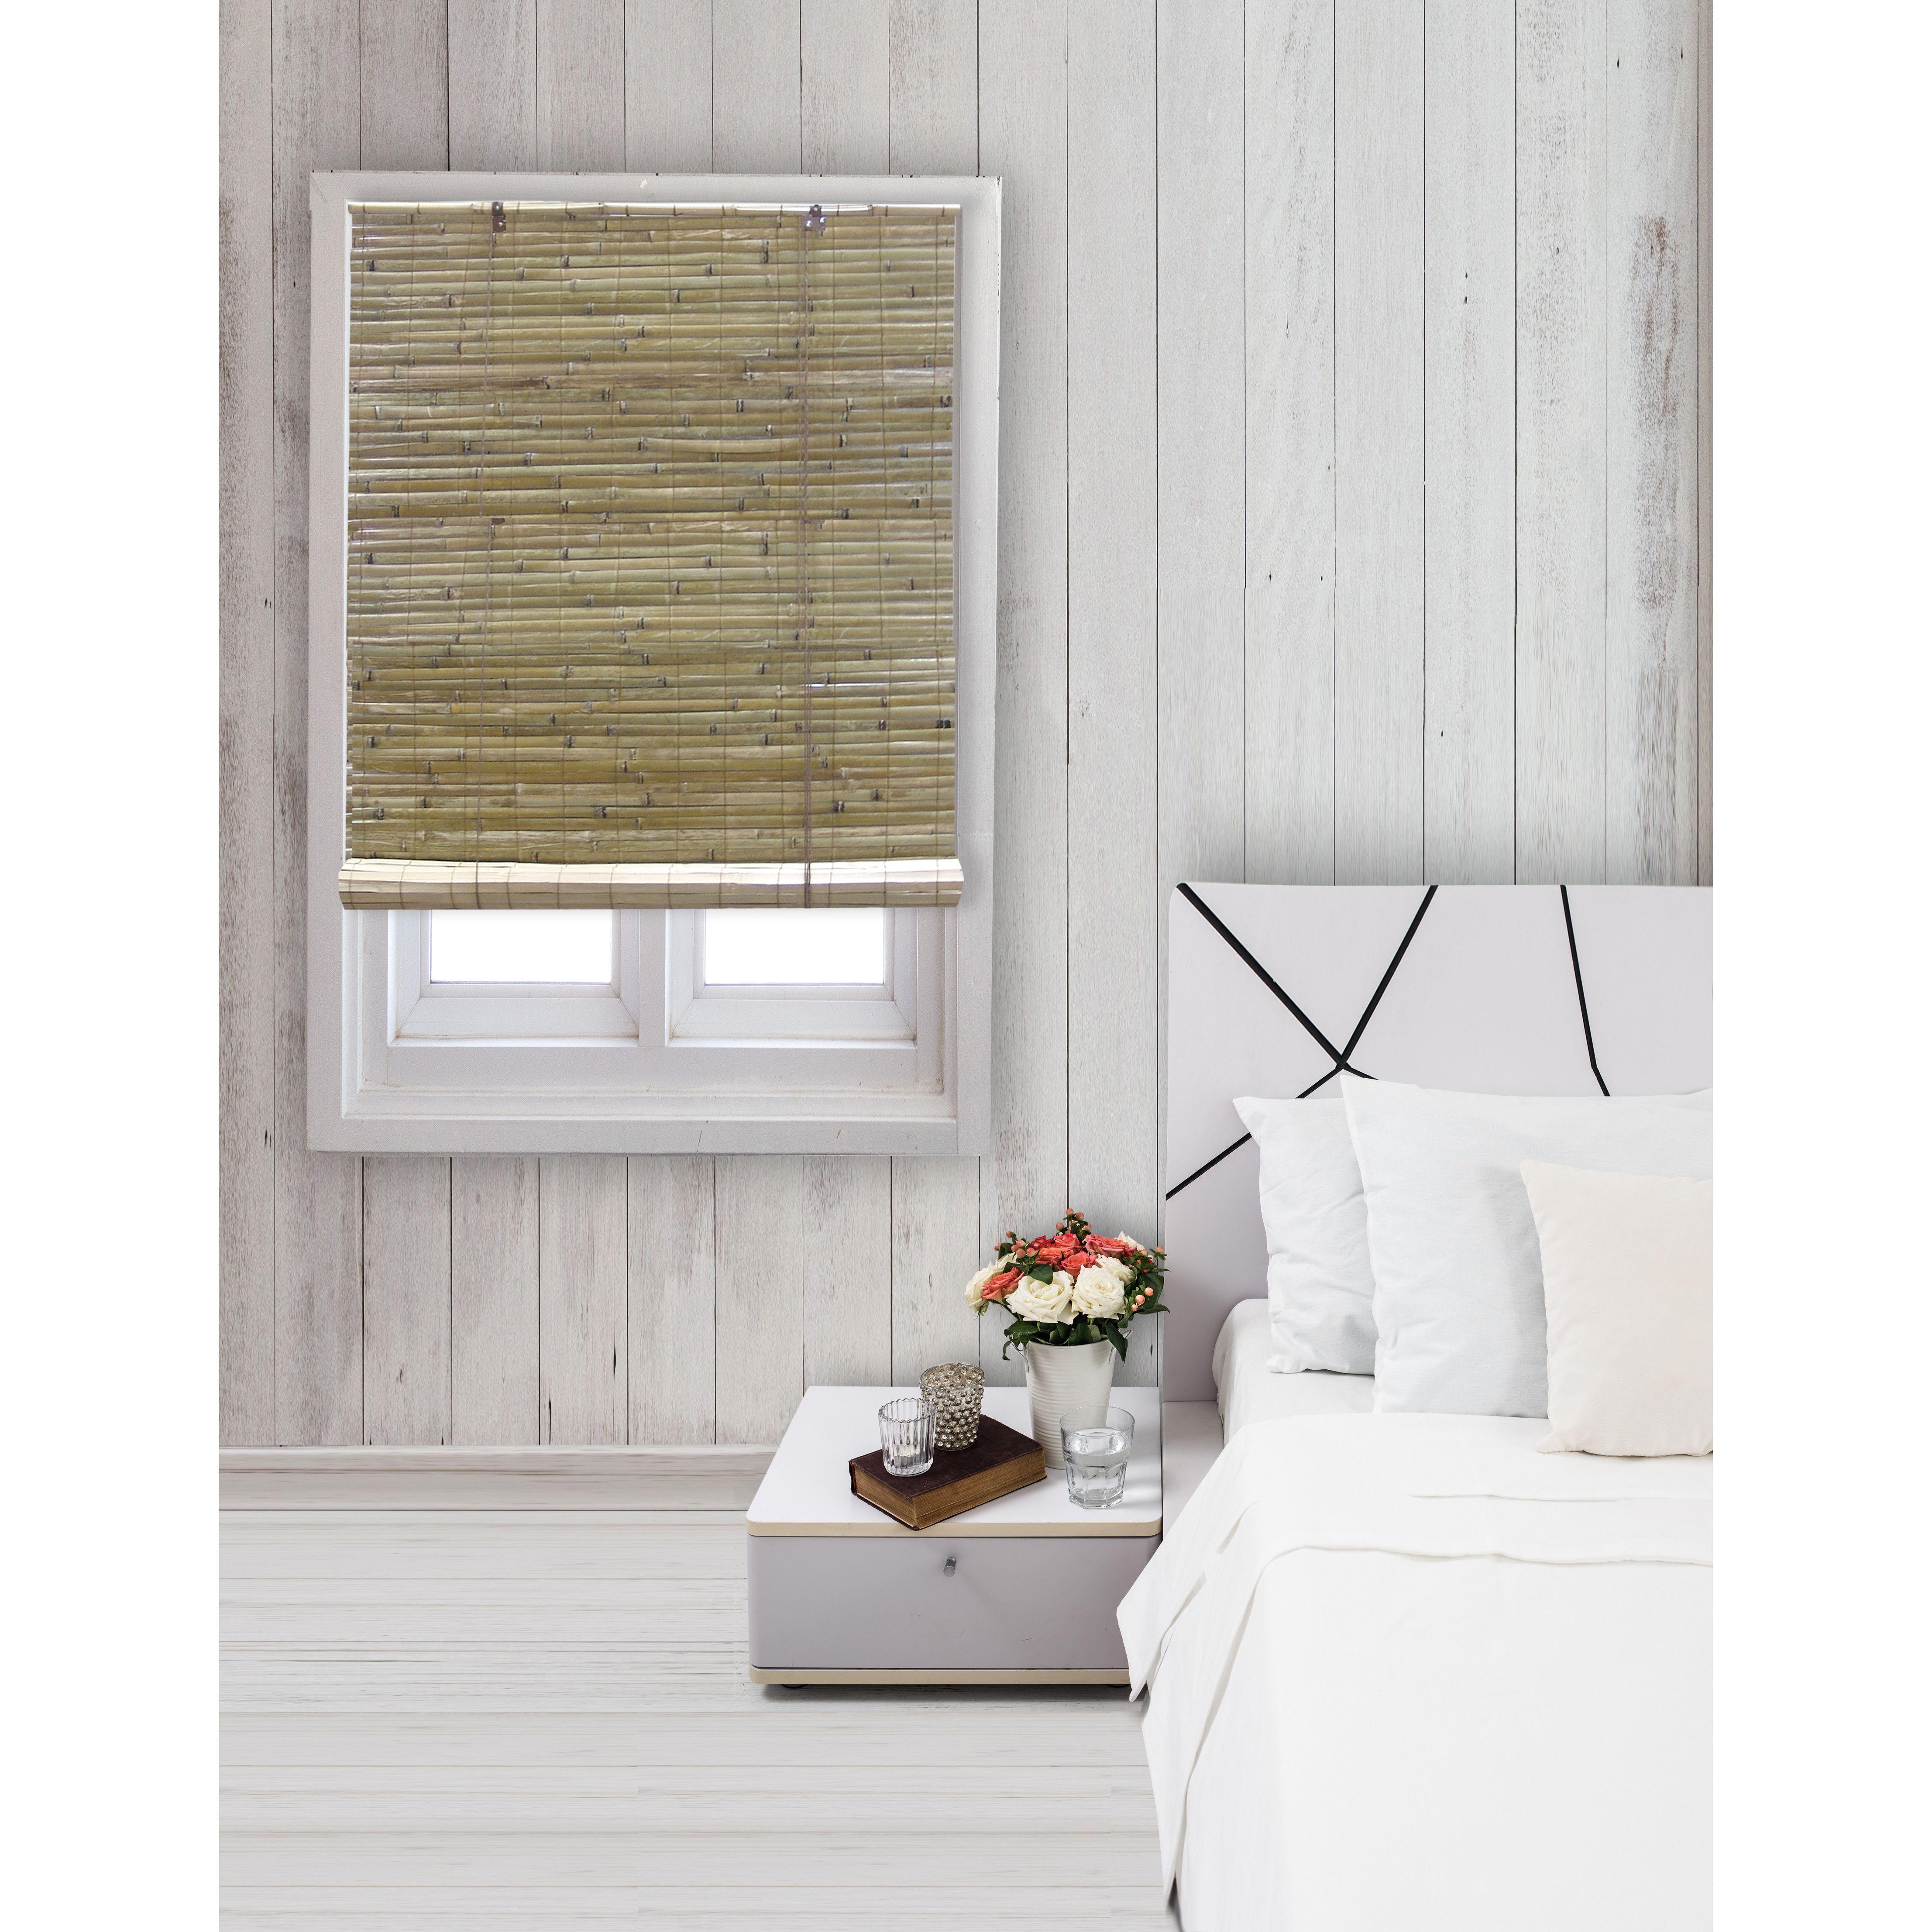 clear home file roller lovely woodgrain window pvc walmart elegant blinds of shade blind interior